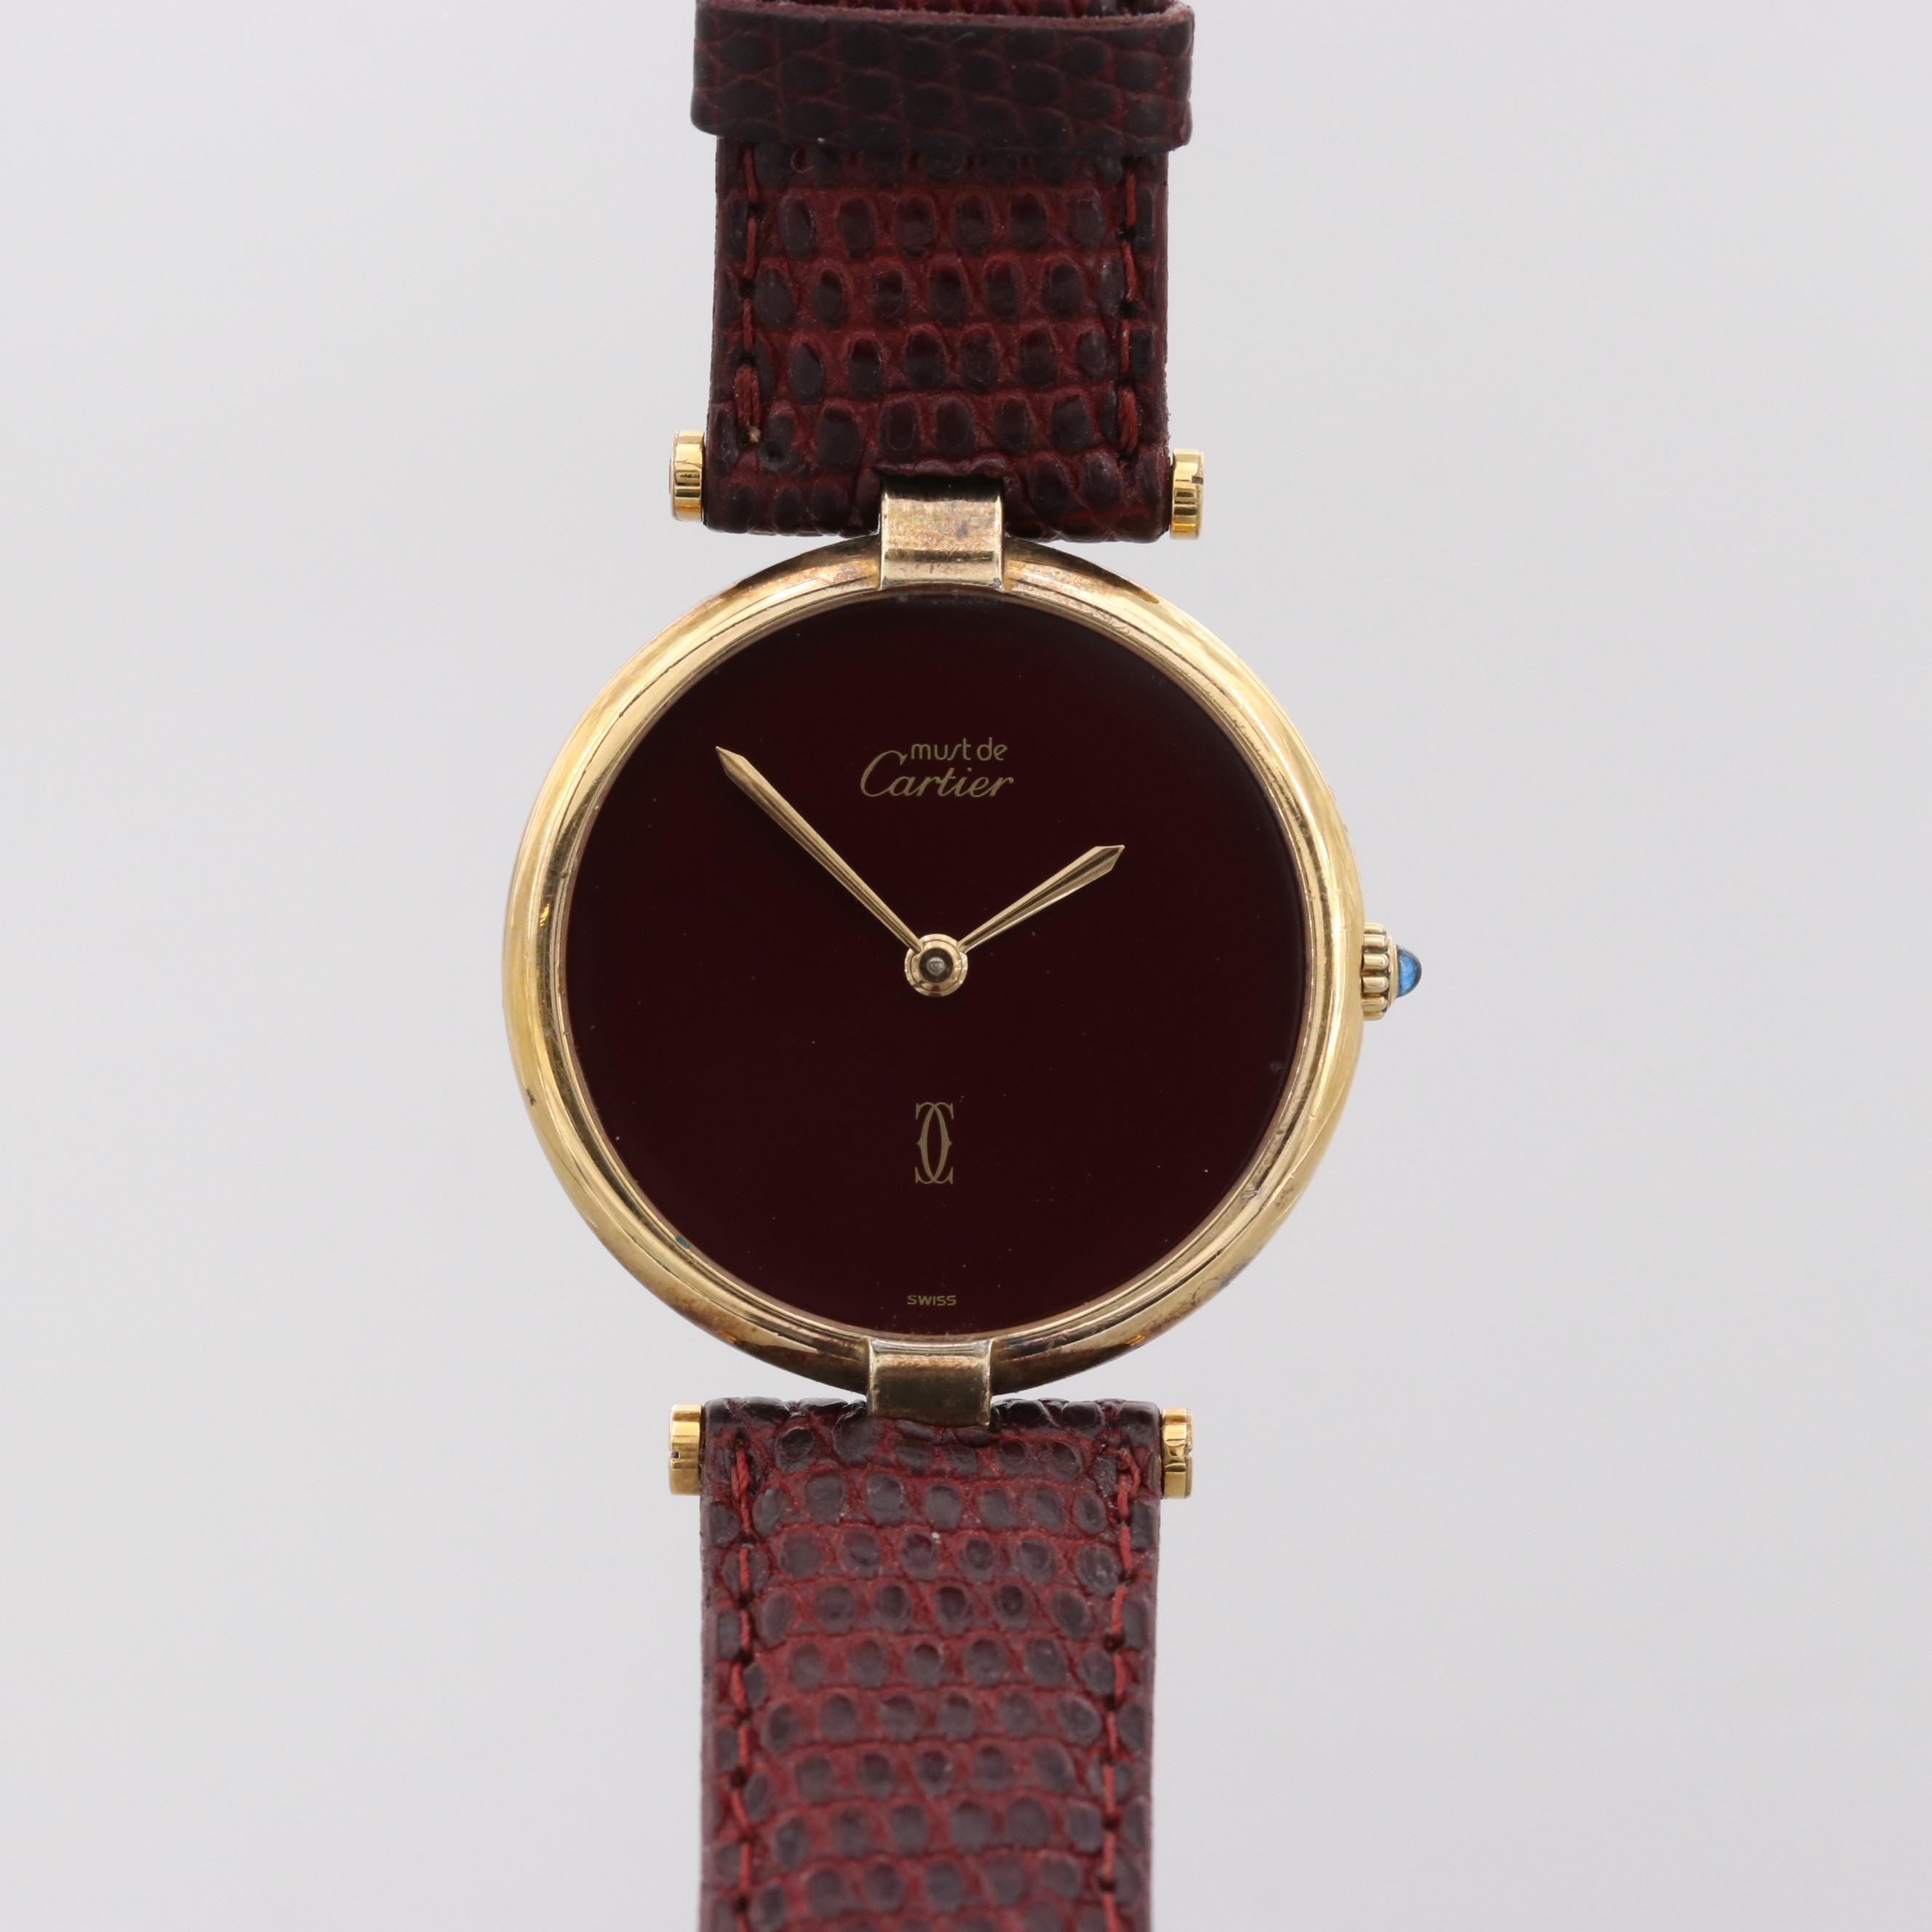 Must de Cartier Gold Plated Sterling Silver Quartz Wristwatch